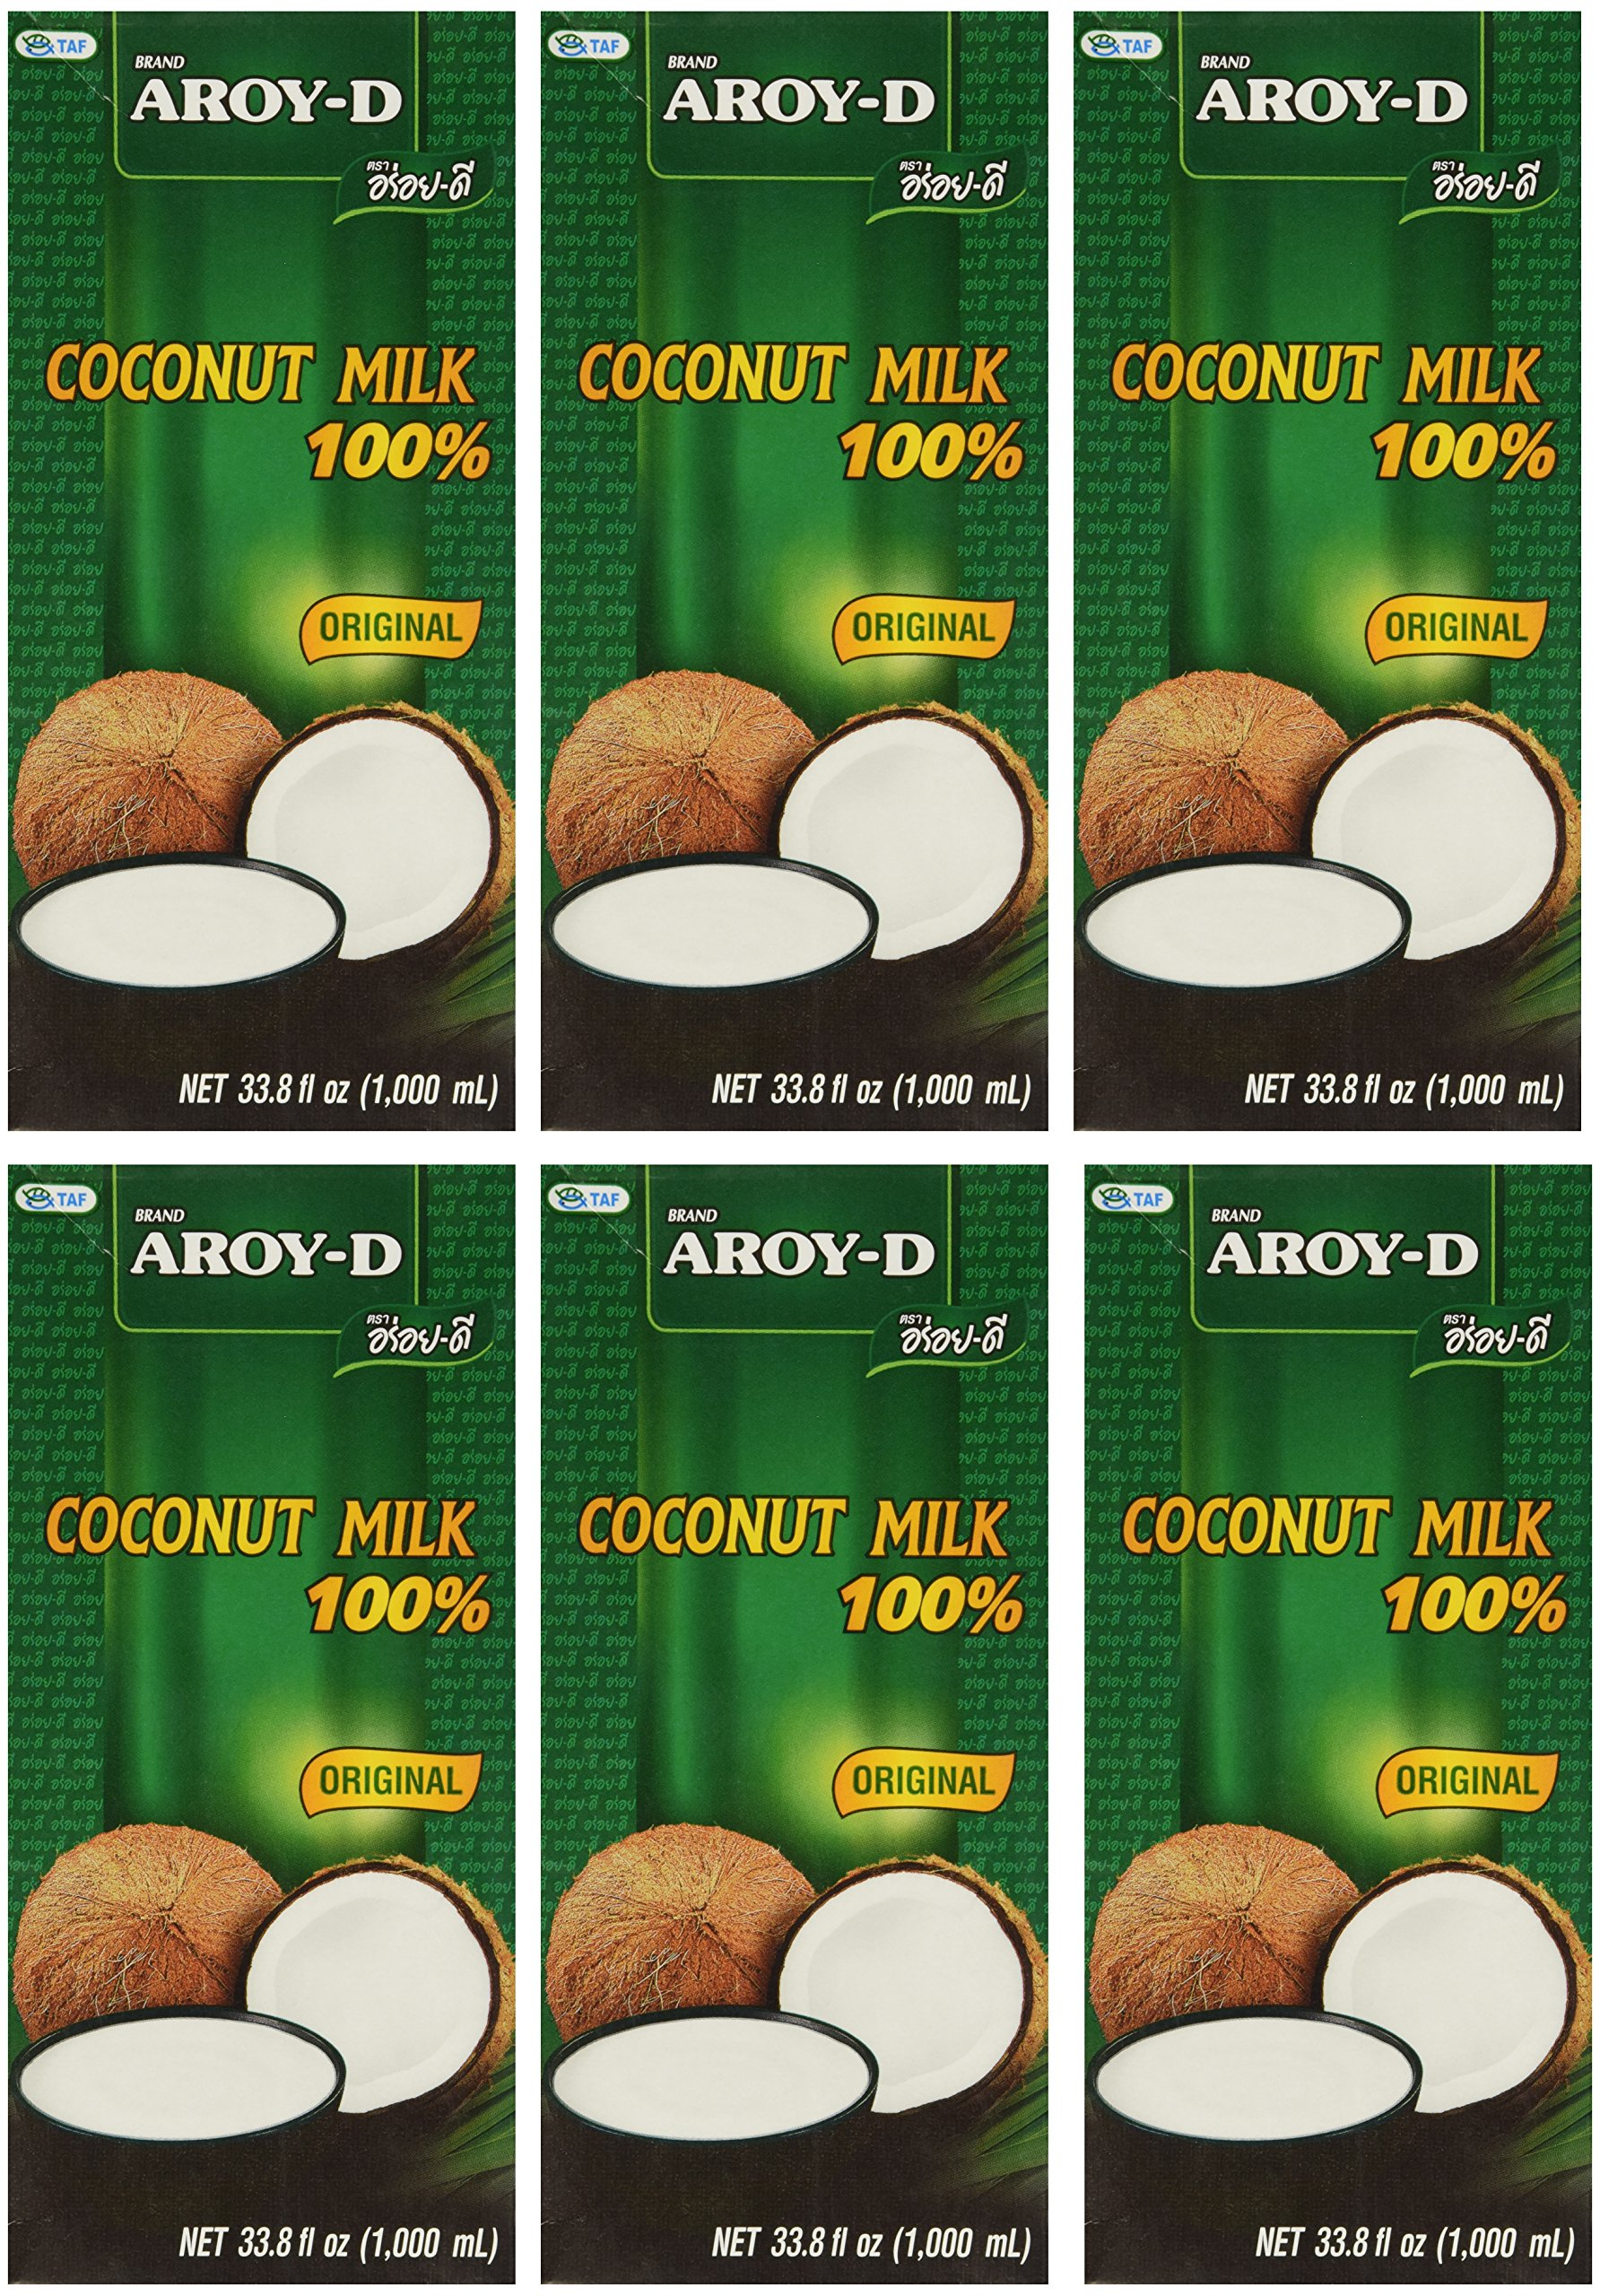 Aroy-D 100% Coconut Milk - 33.8 oz packages (6-pack)